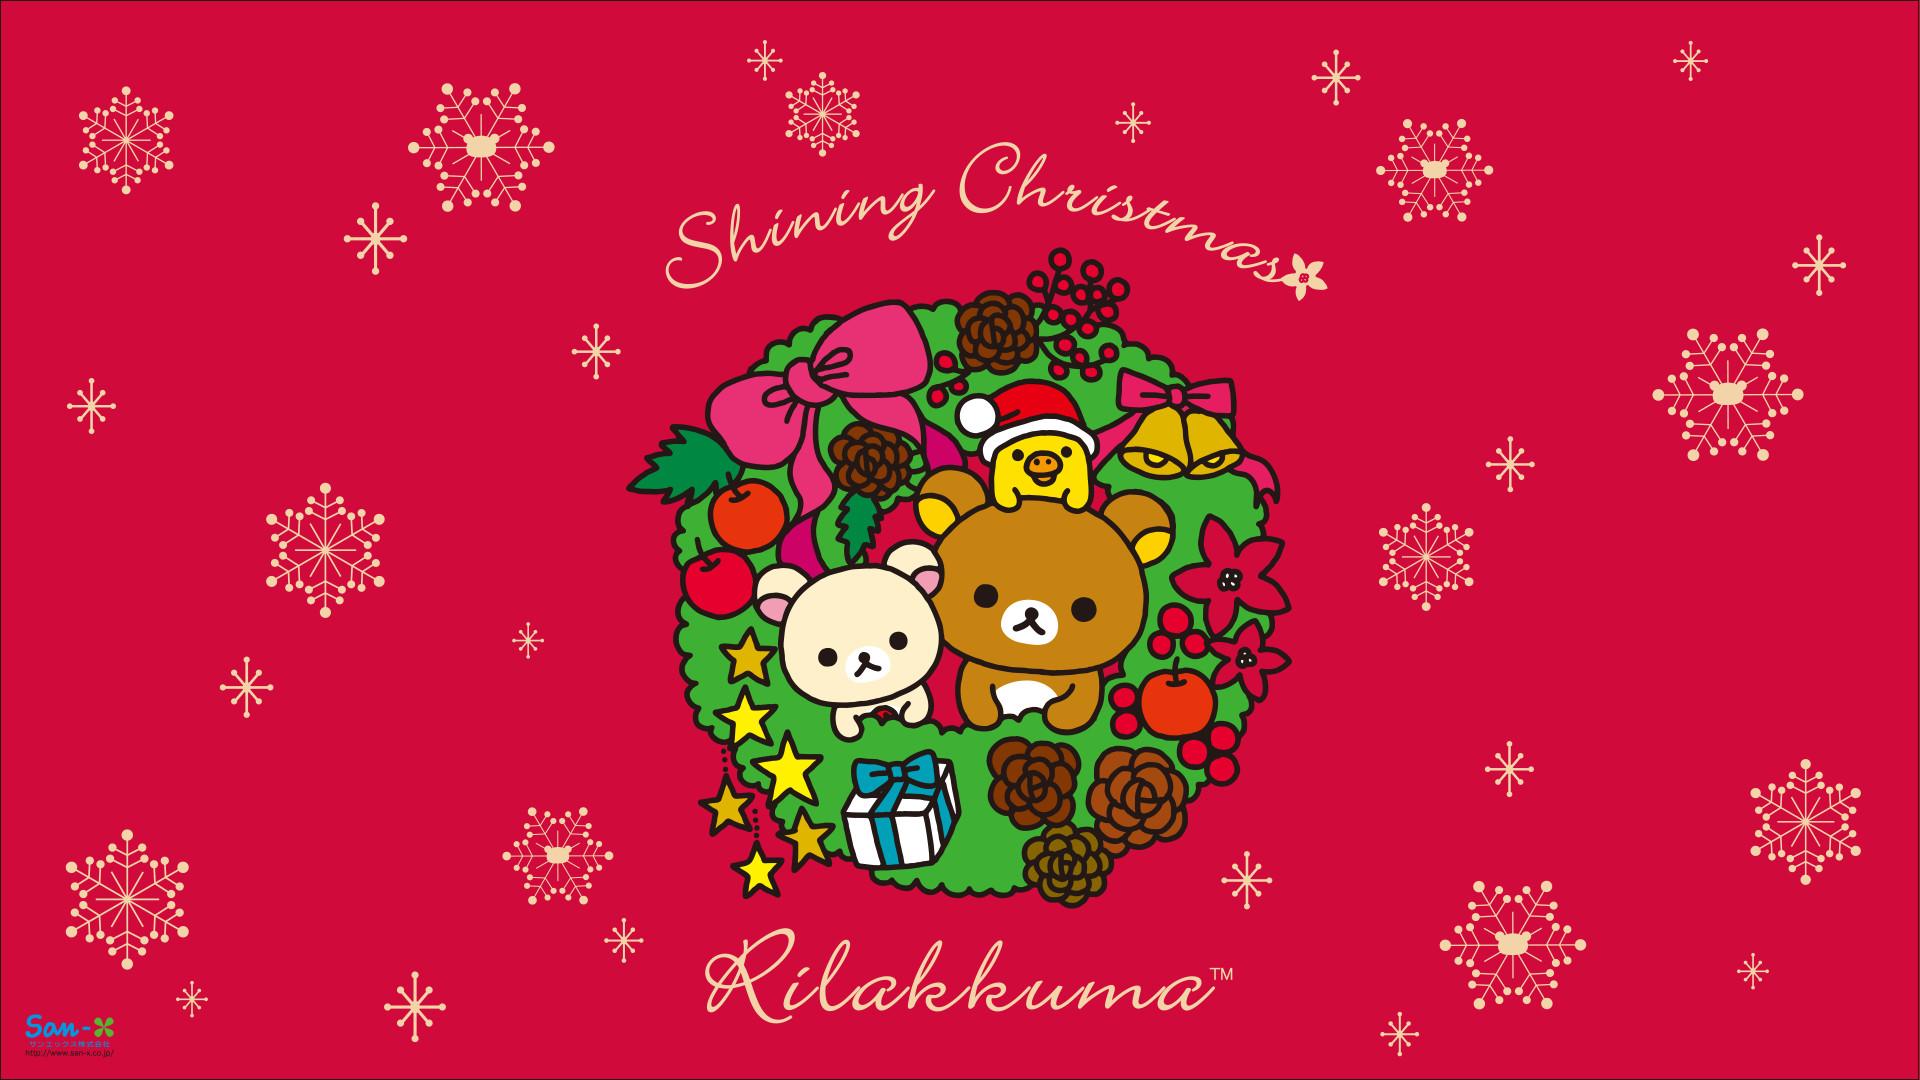 New 2015 Rilakkuma Christmas Wallpaper